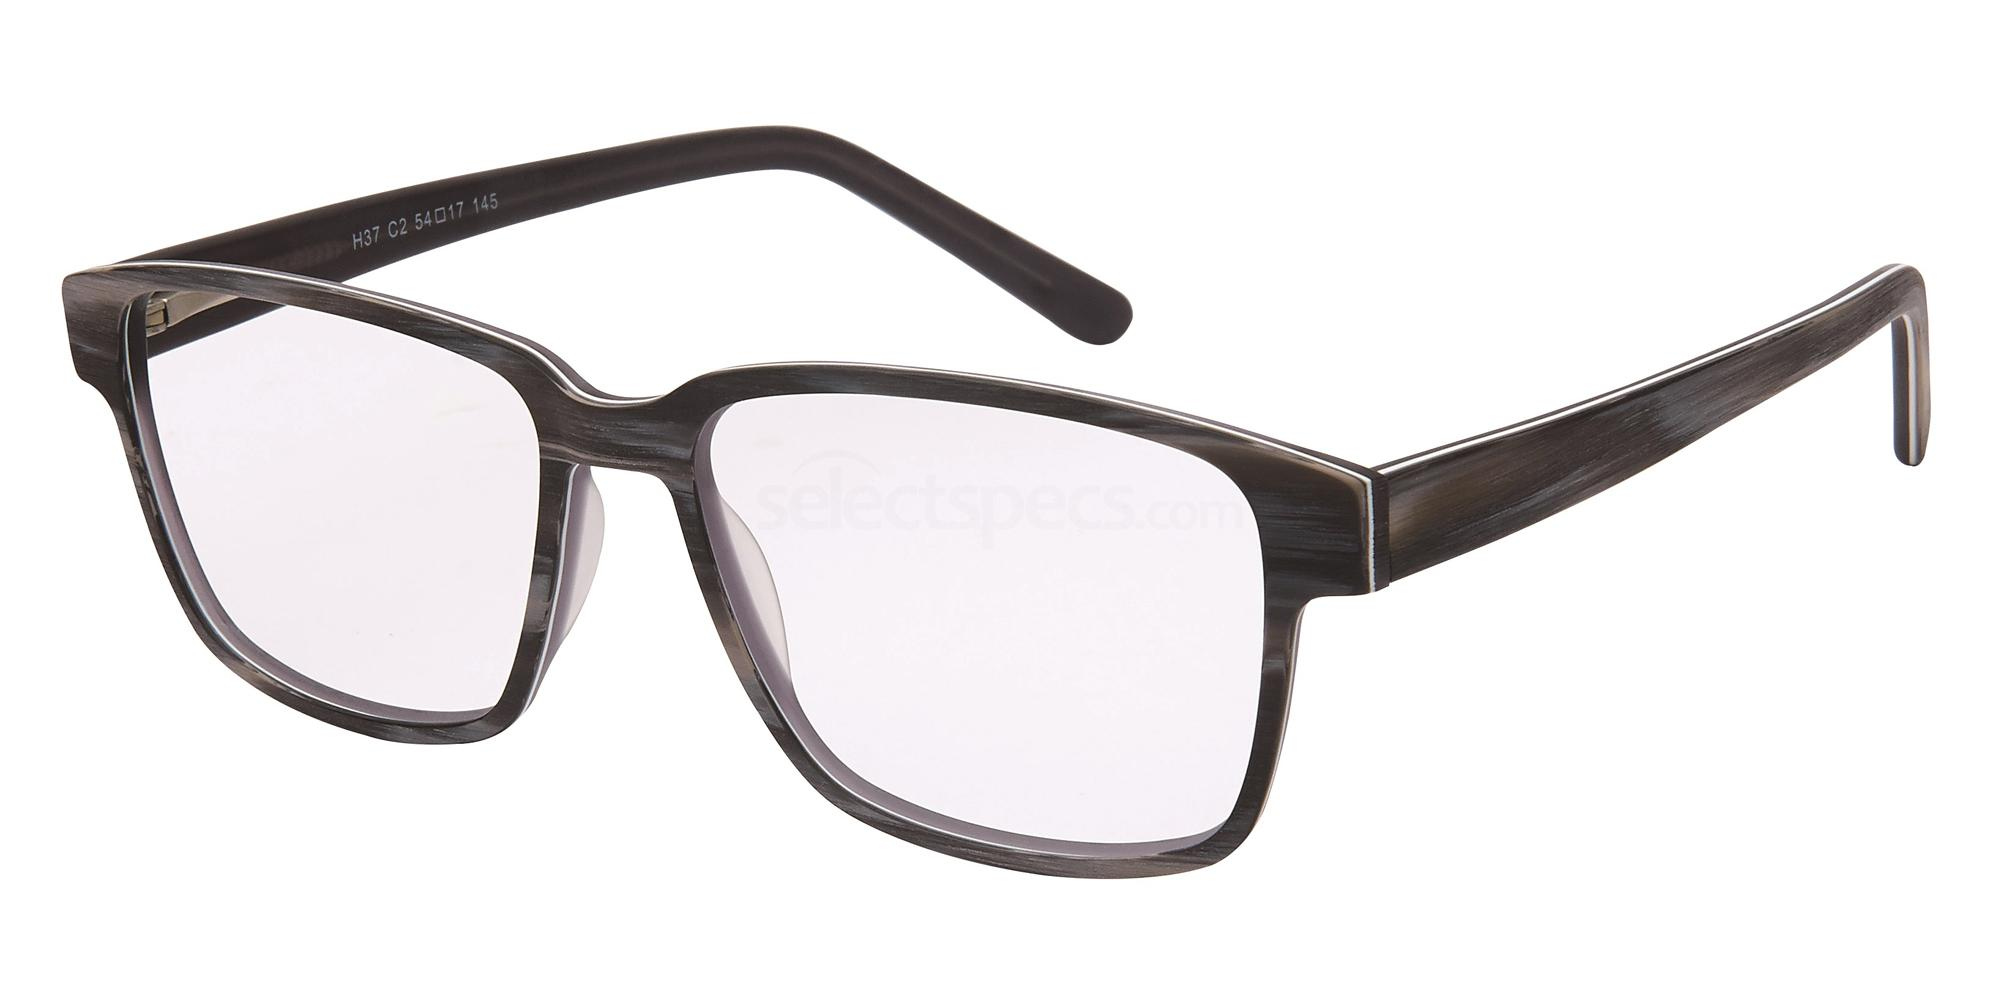 C2 H37 Glasses, Halstrom